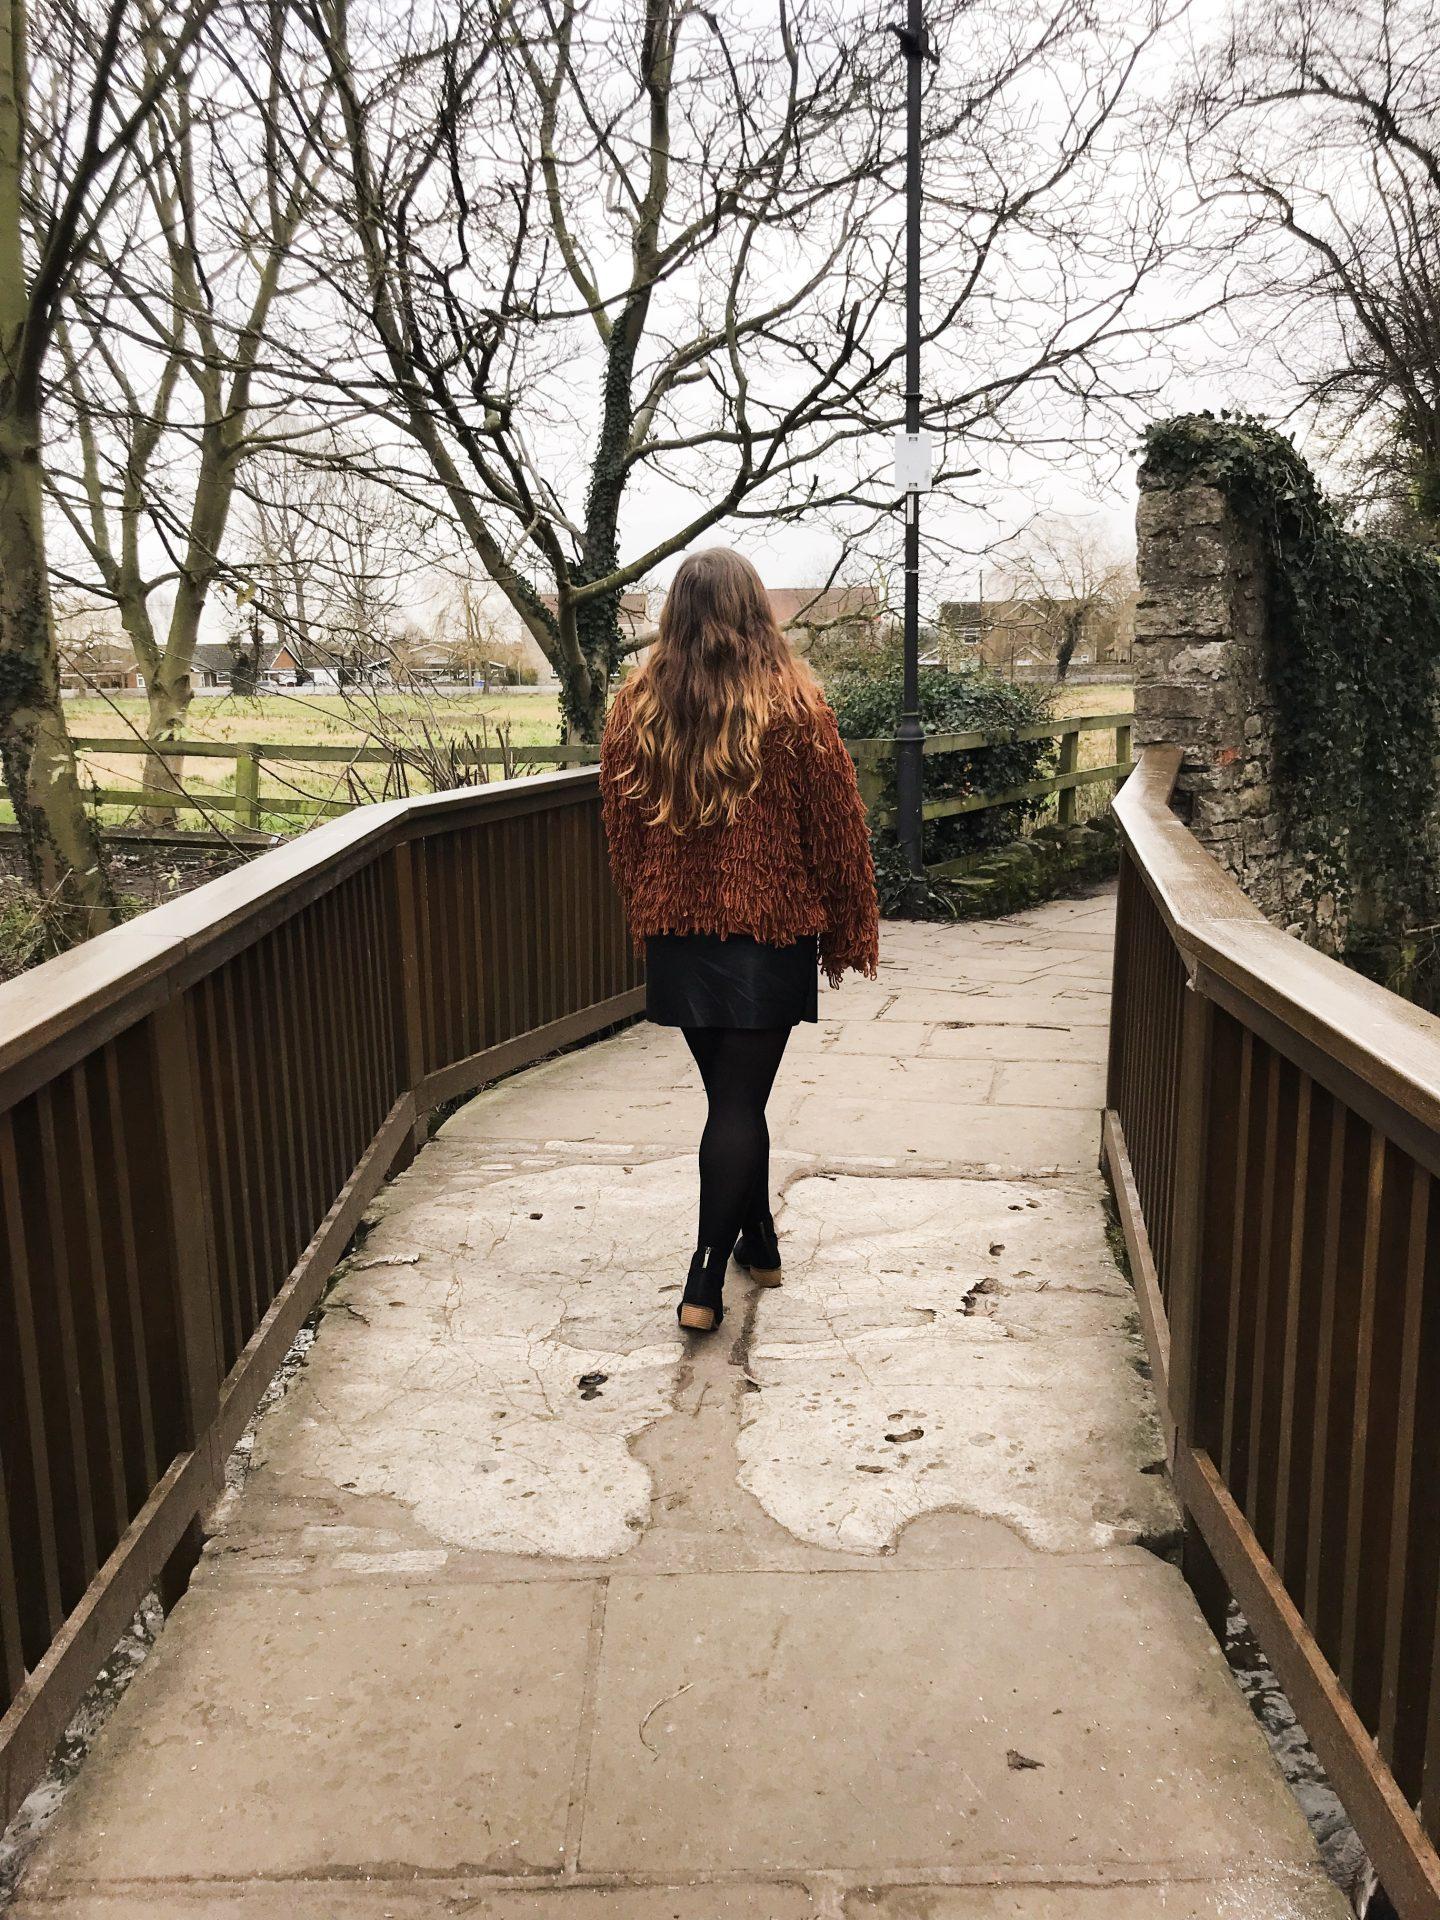 Image of me walking over a bridge